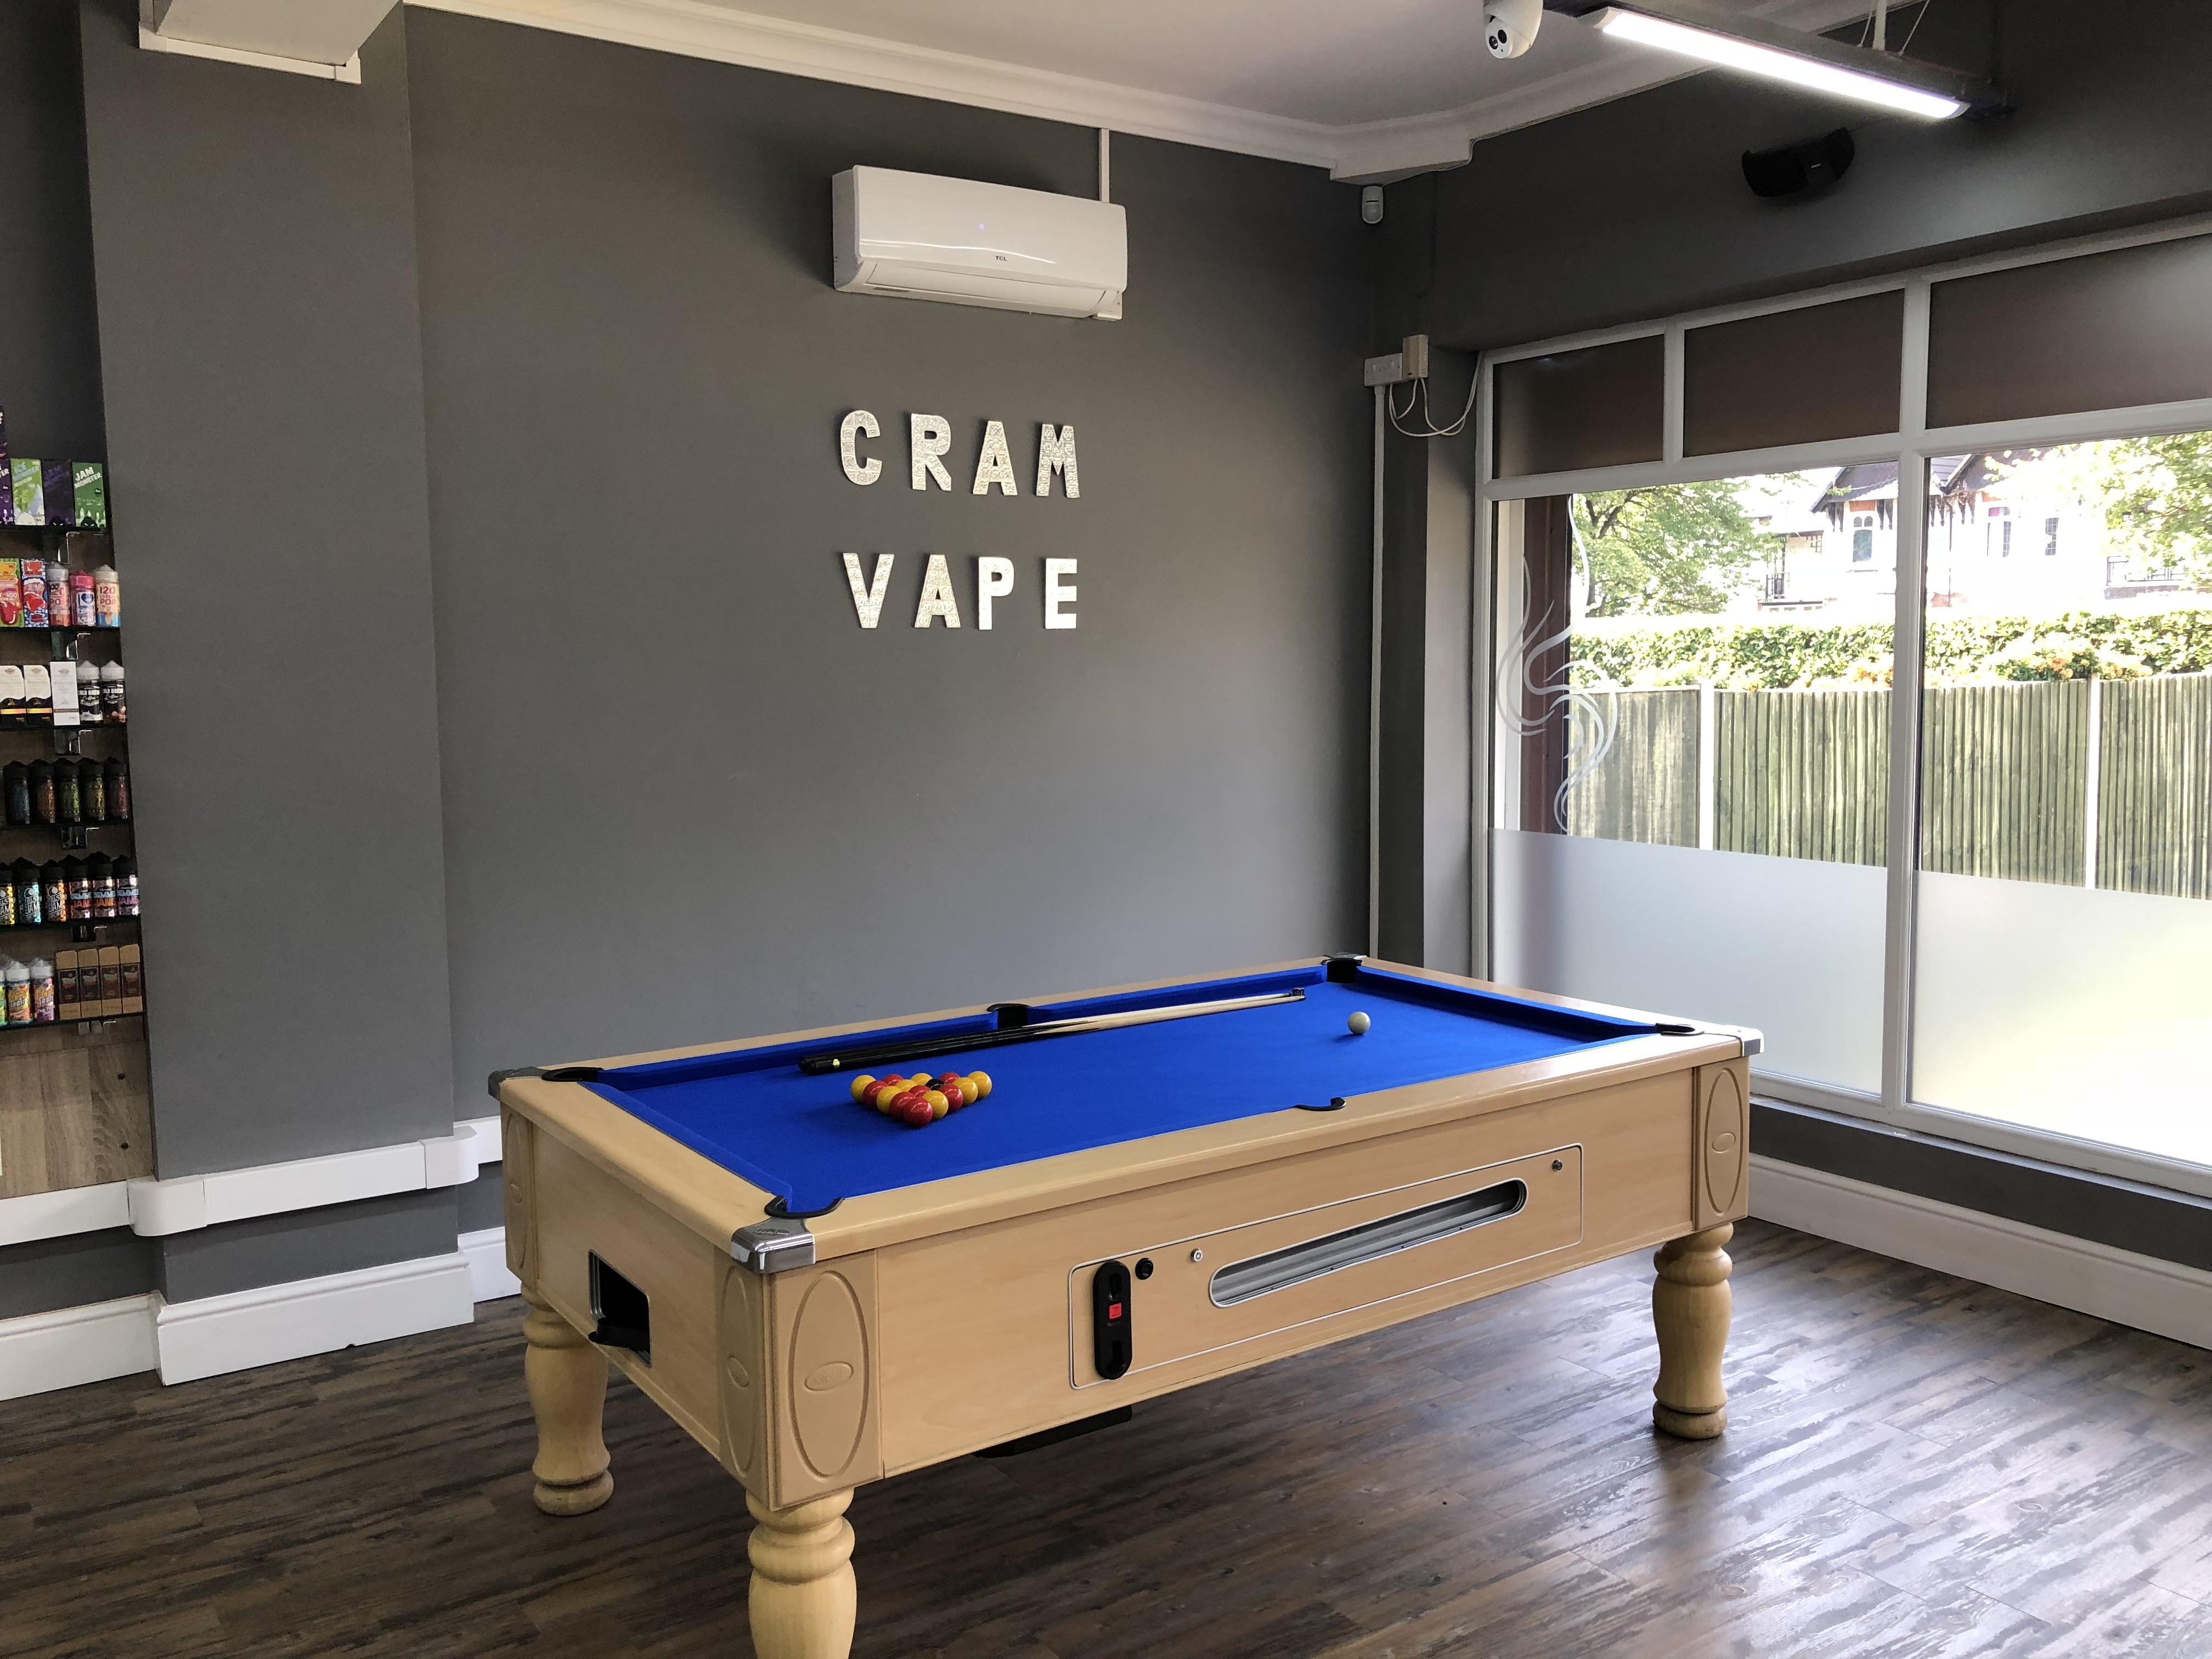 Cram Vape